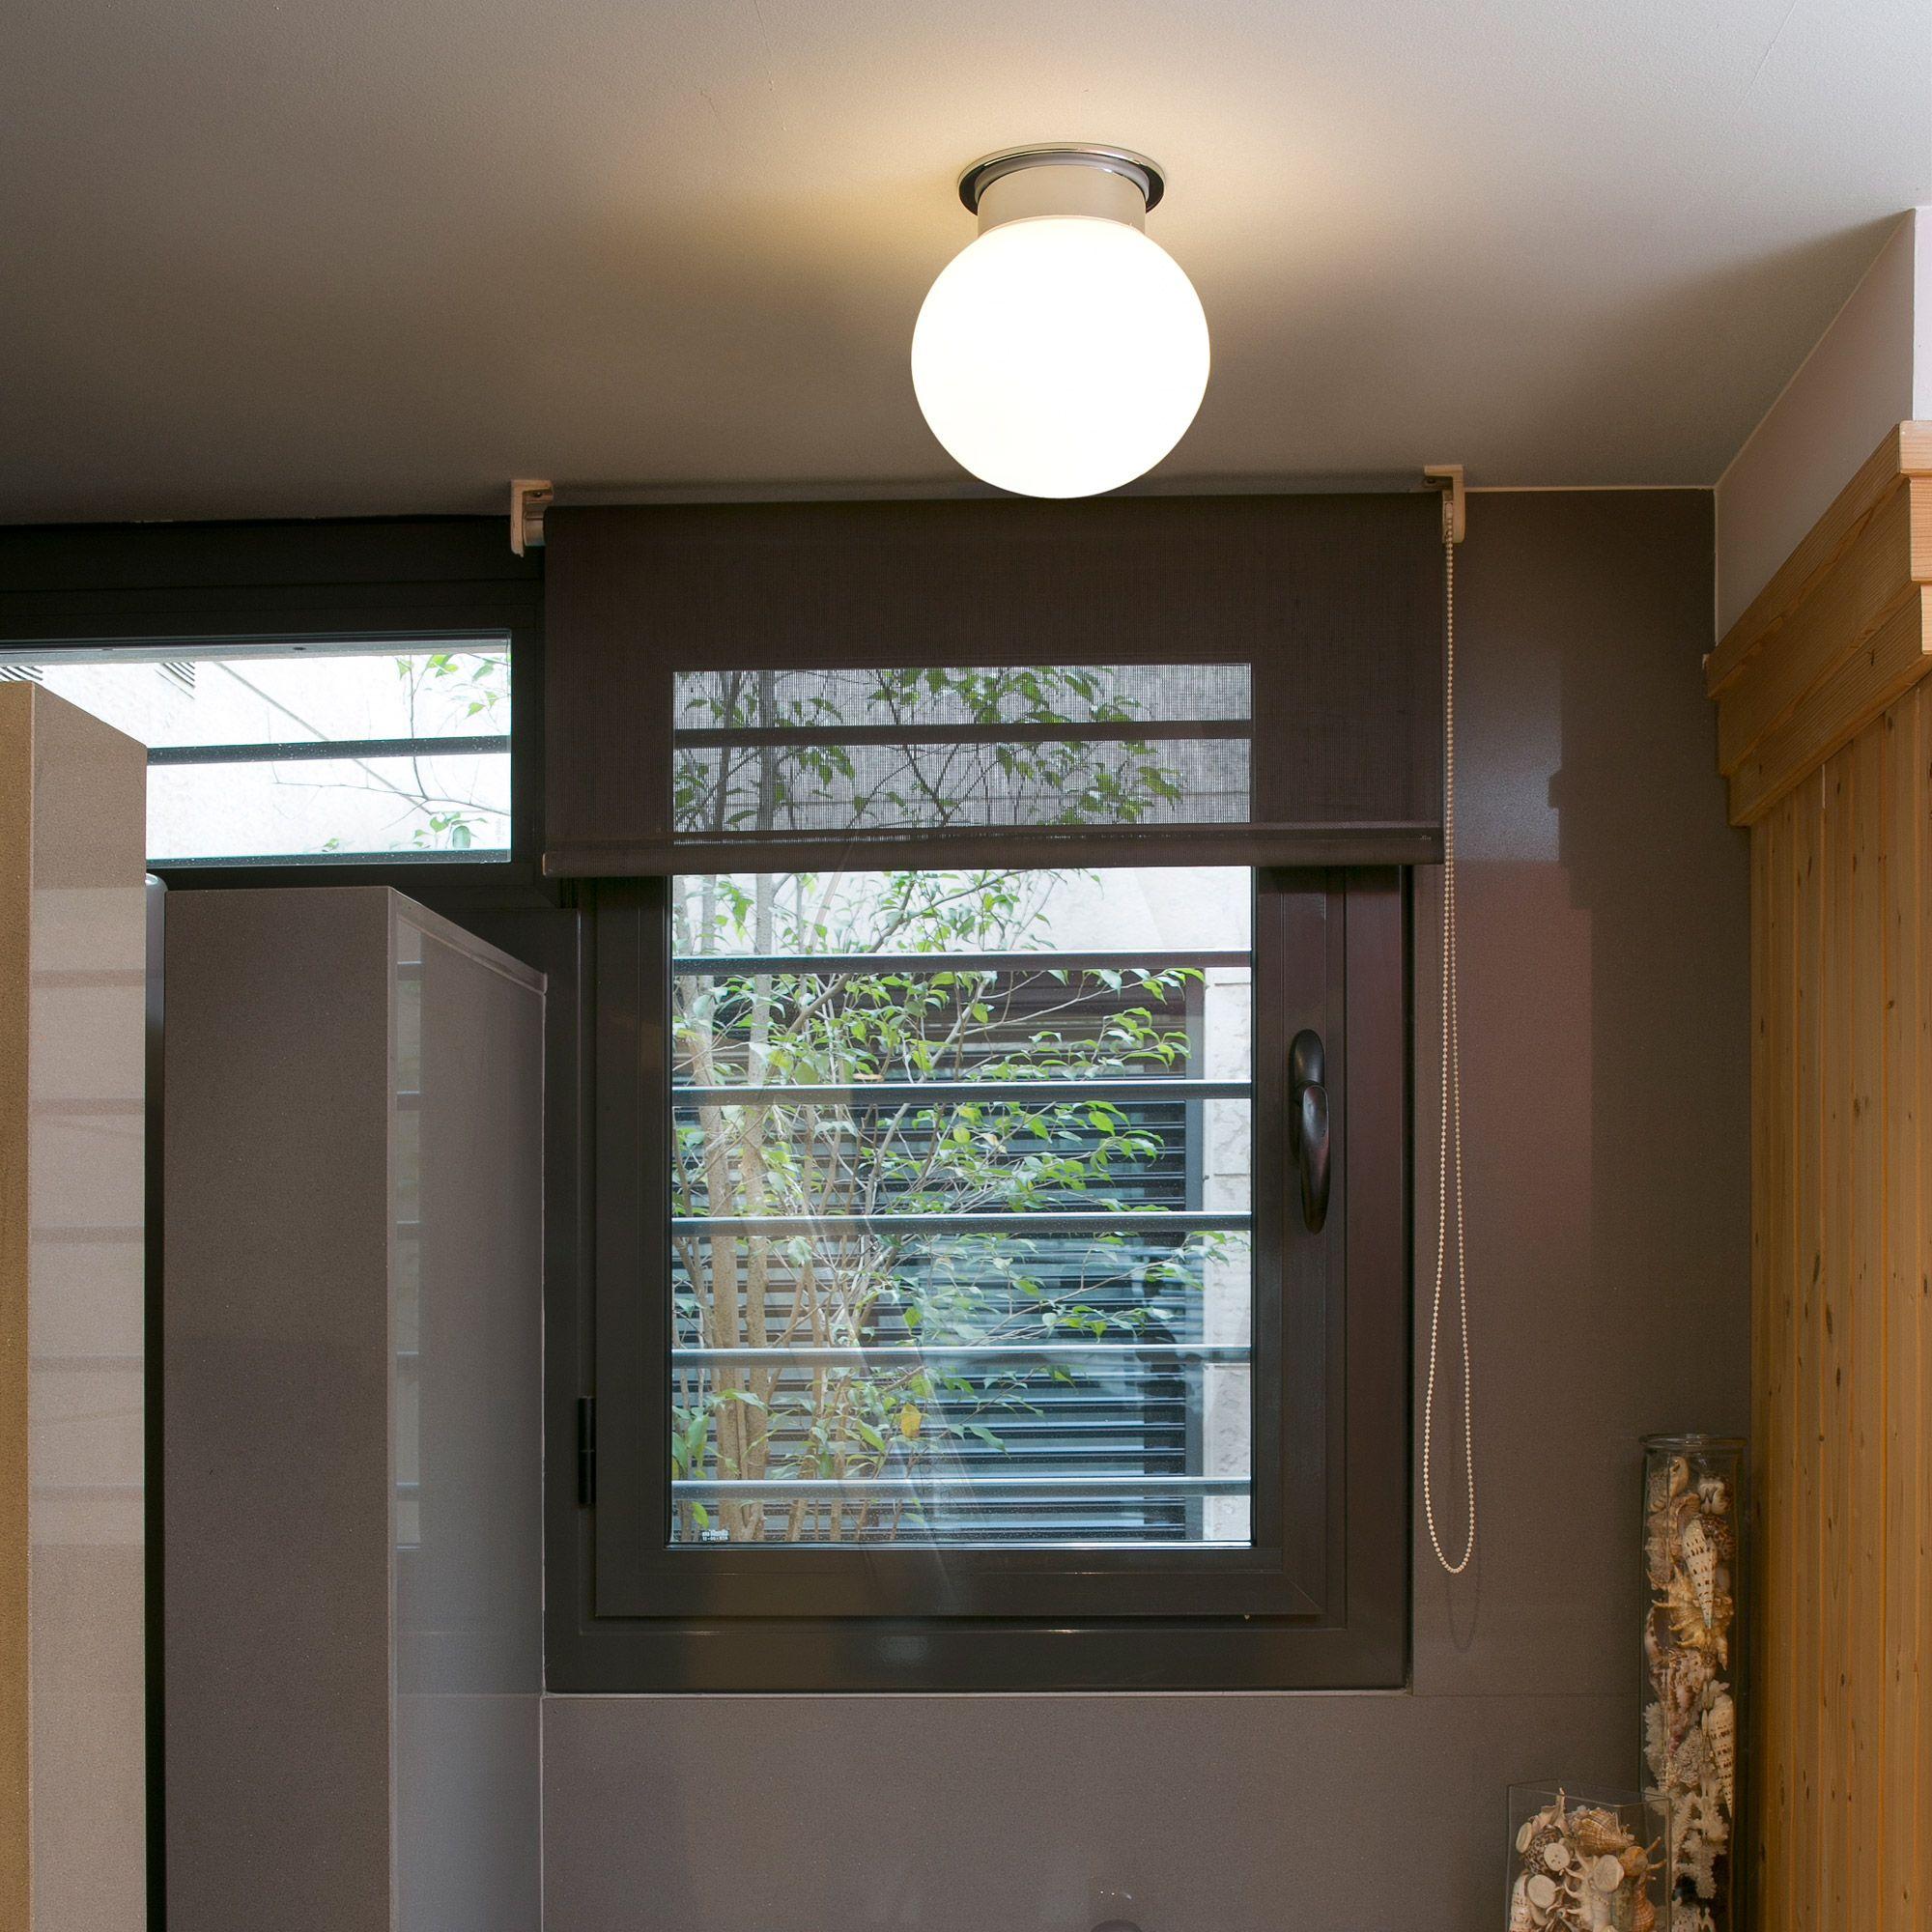 plafonnier de salle de bain globe en mtal et verre diamtre 21cm cora marque - Salle De Bain Metal